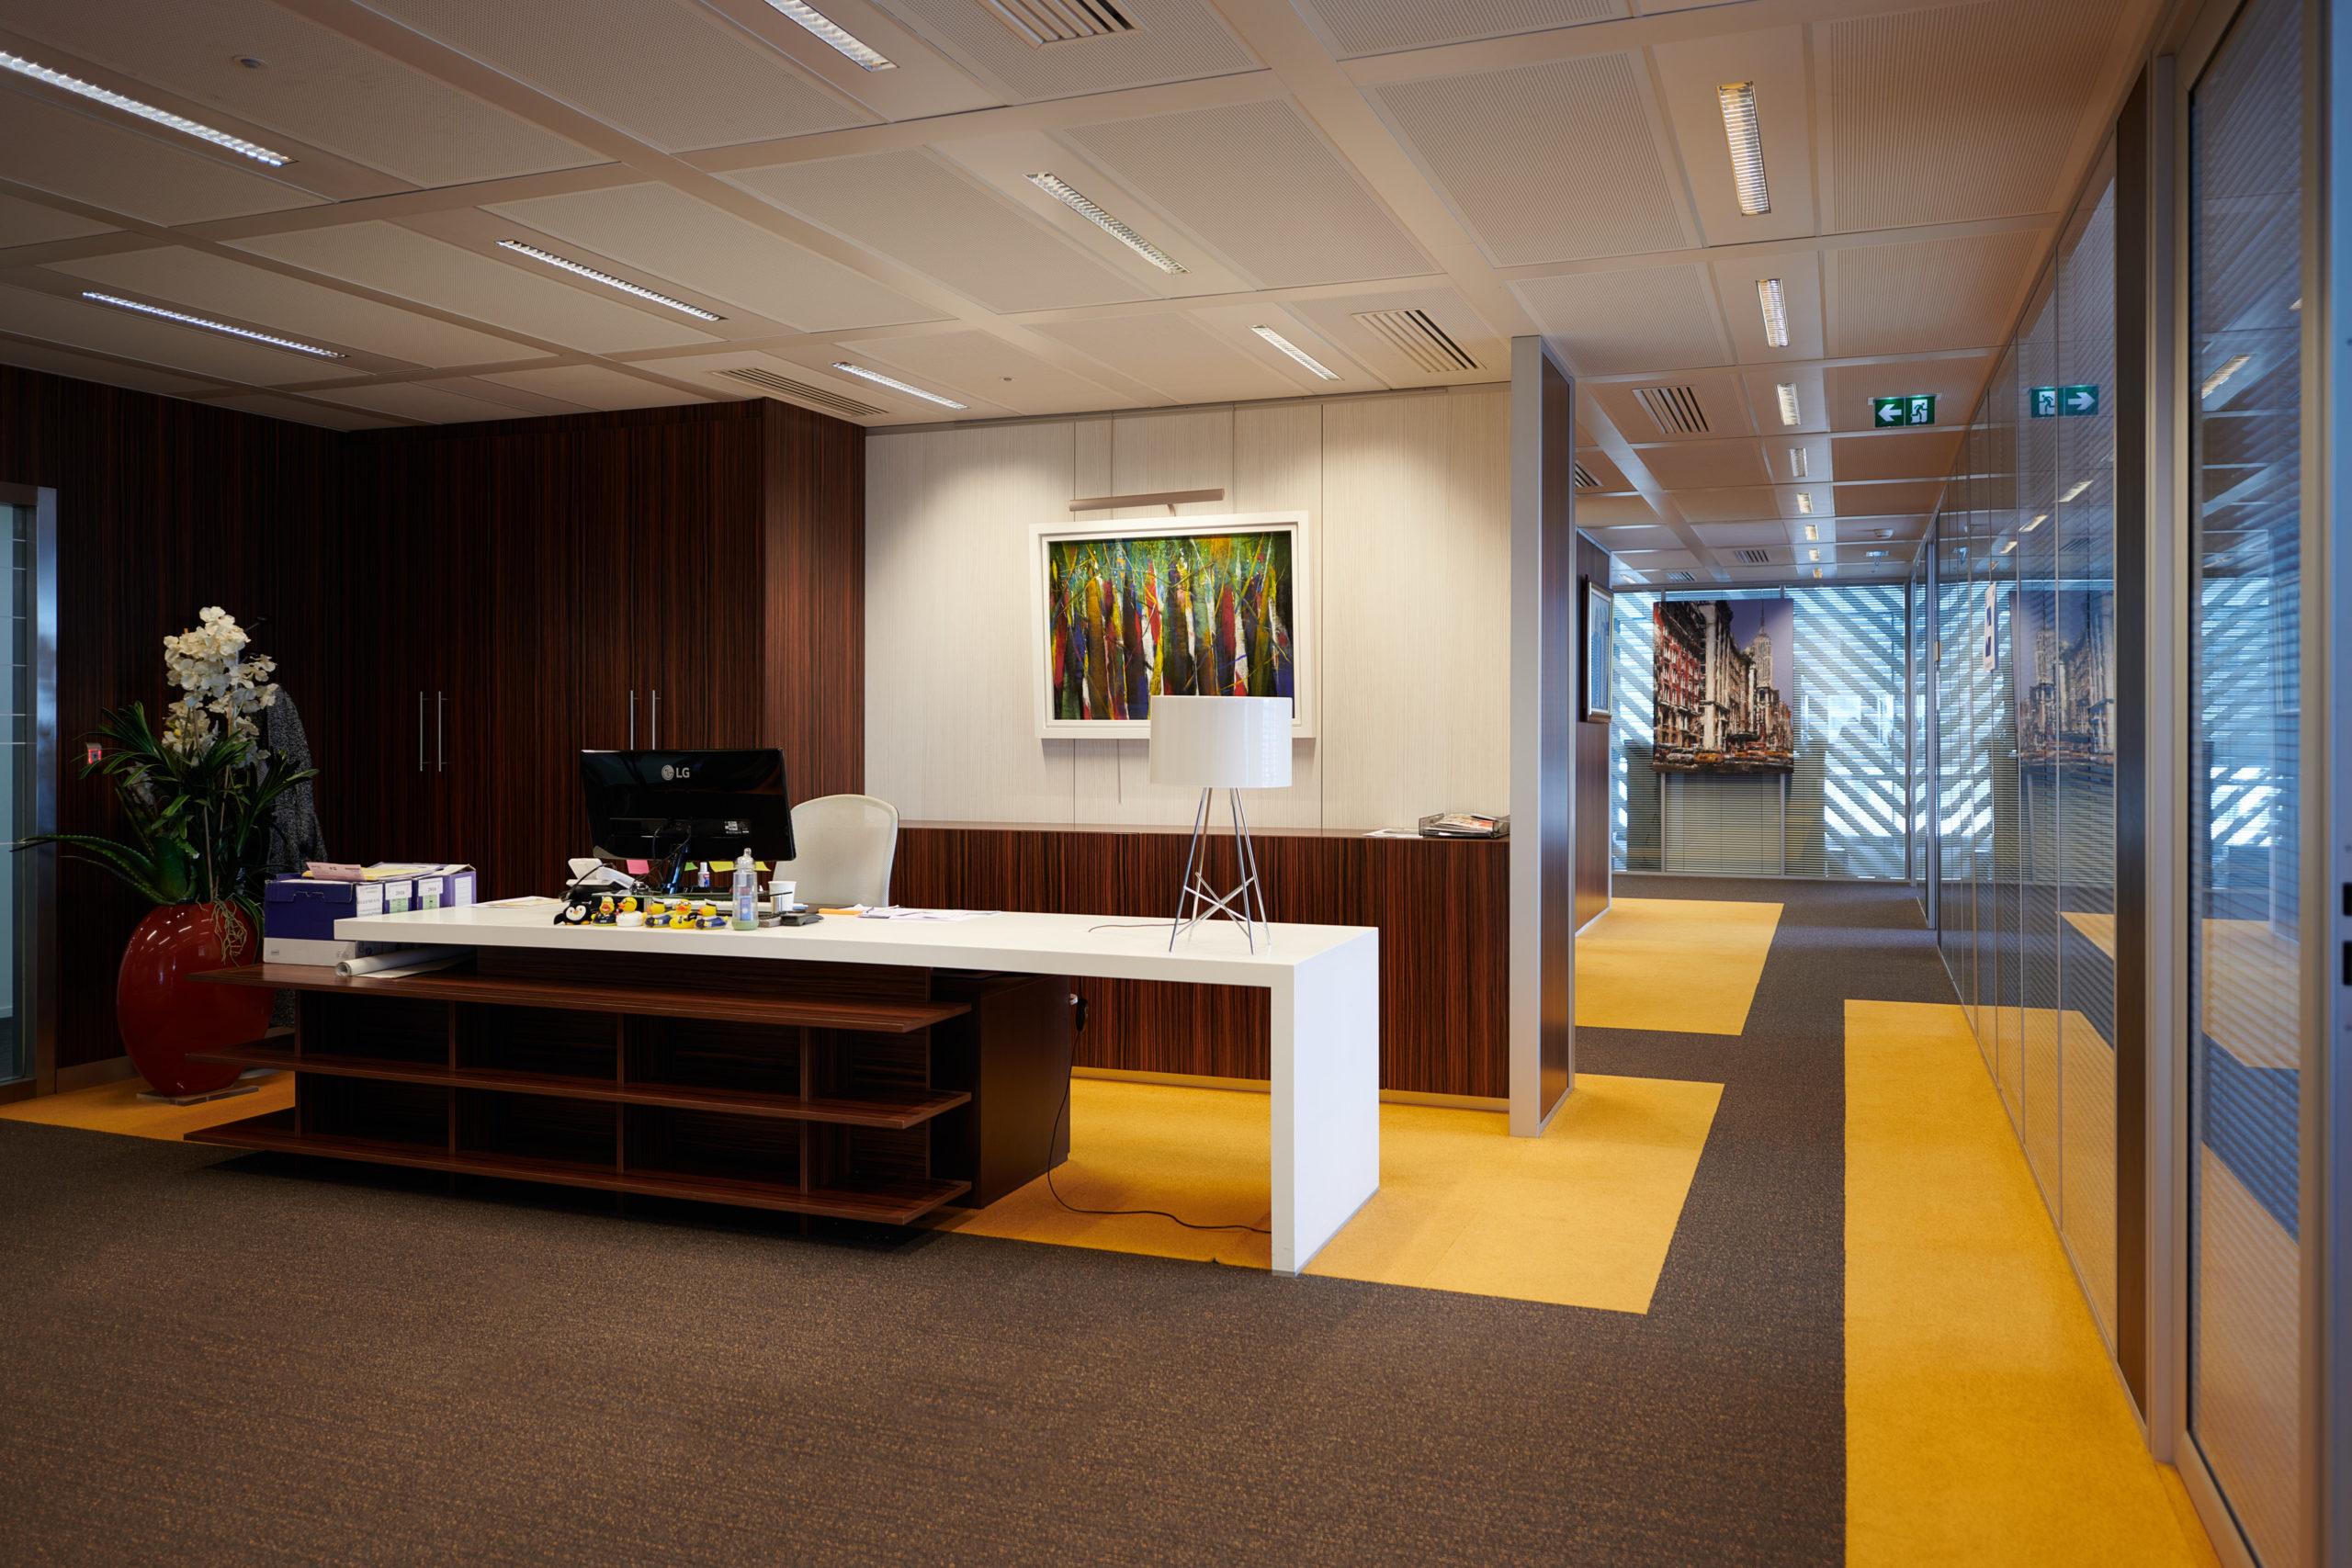 HDI-banque d'accueil-espace d'accueil sur mesure